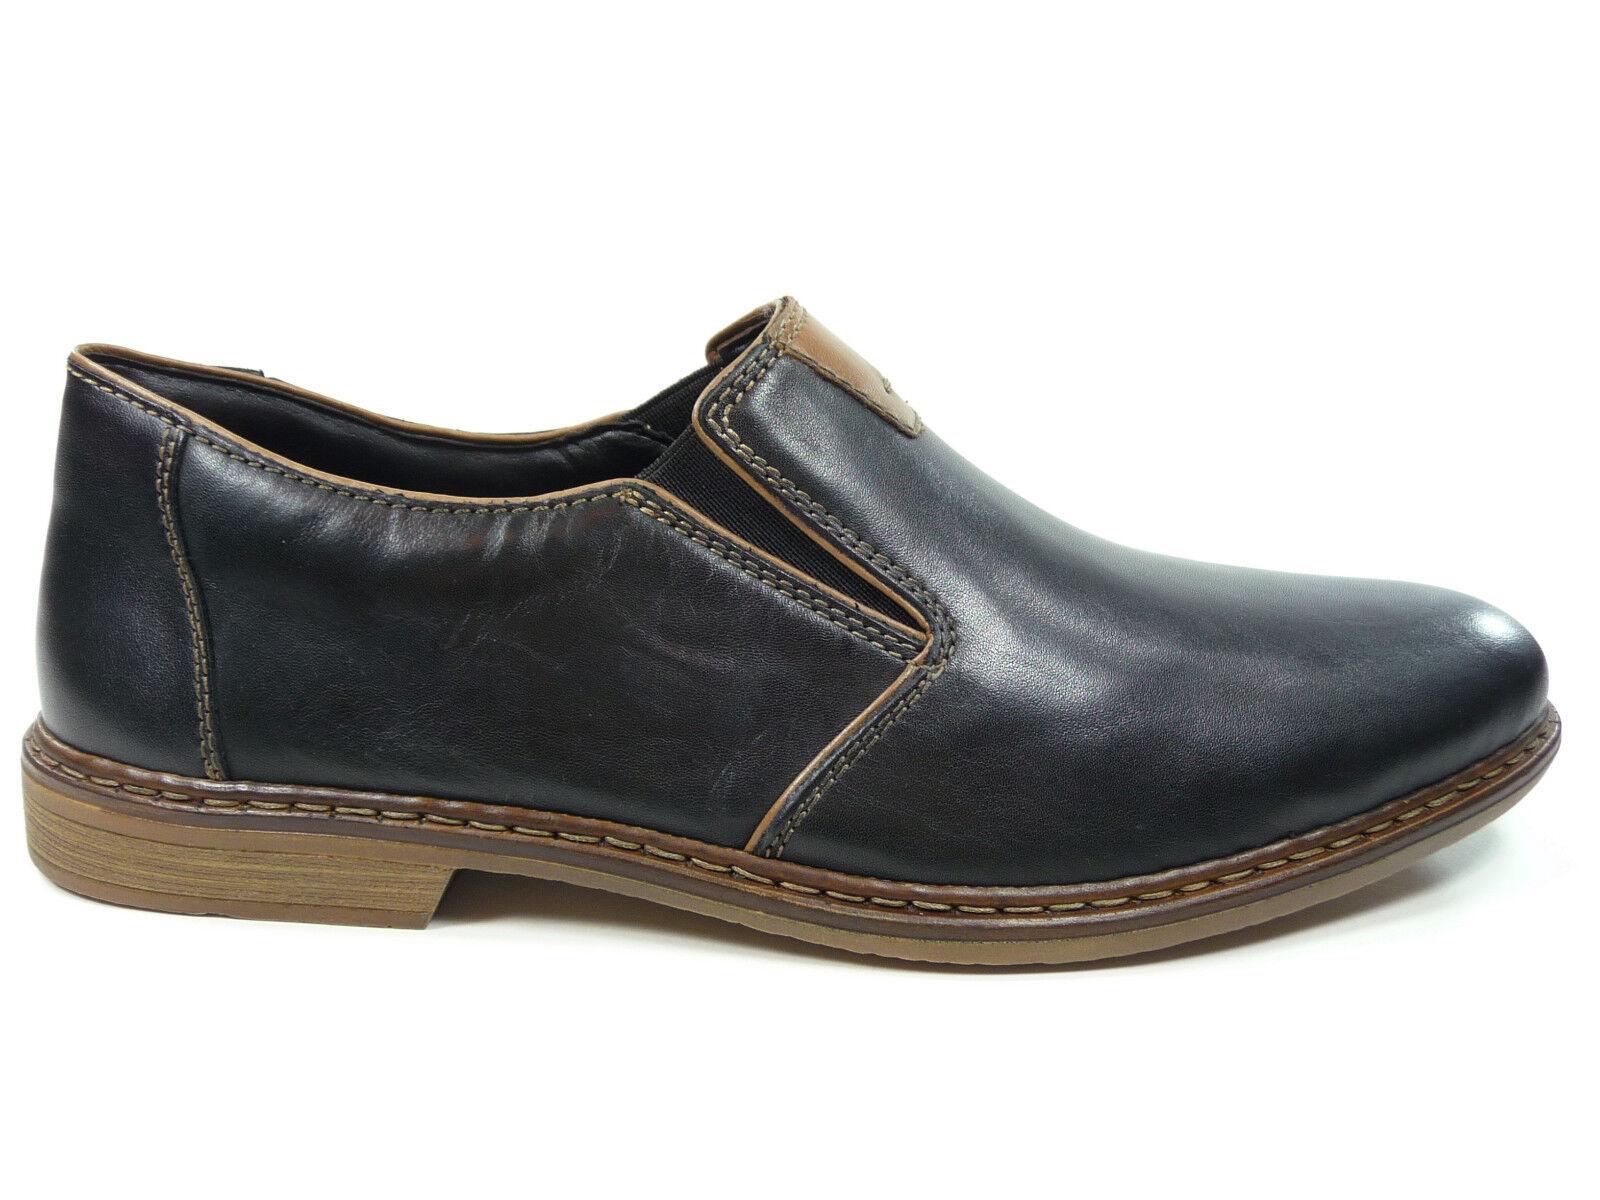 Stiefel 707d7e3 kein 41 DE Gr. Stiefelies Ankle Damen